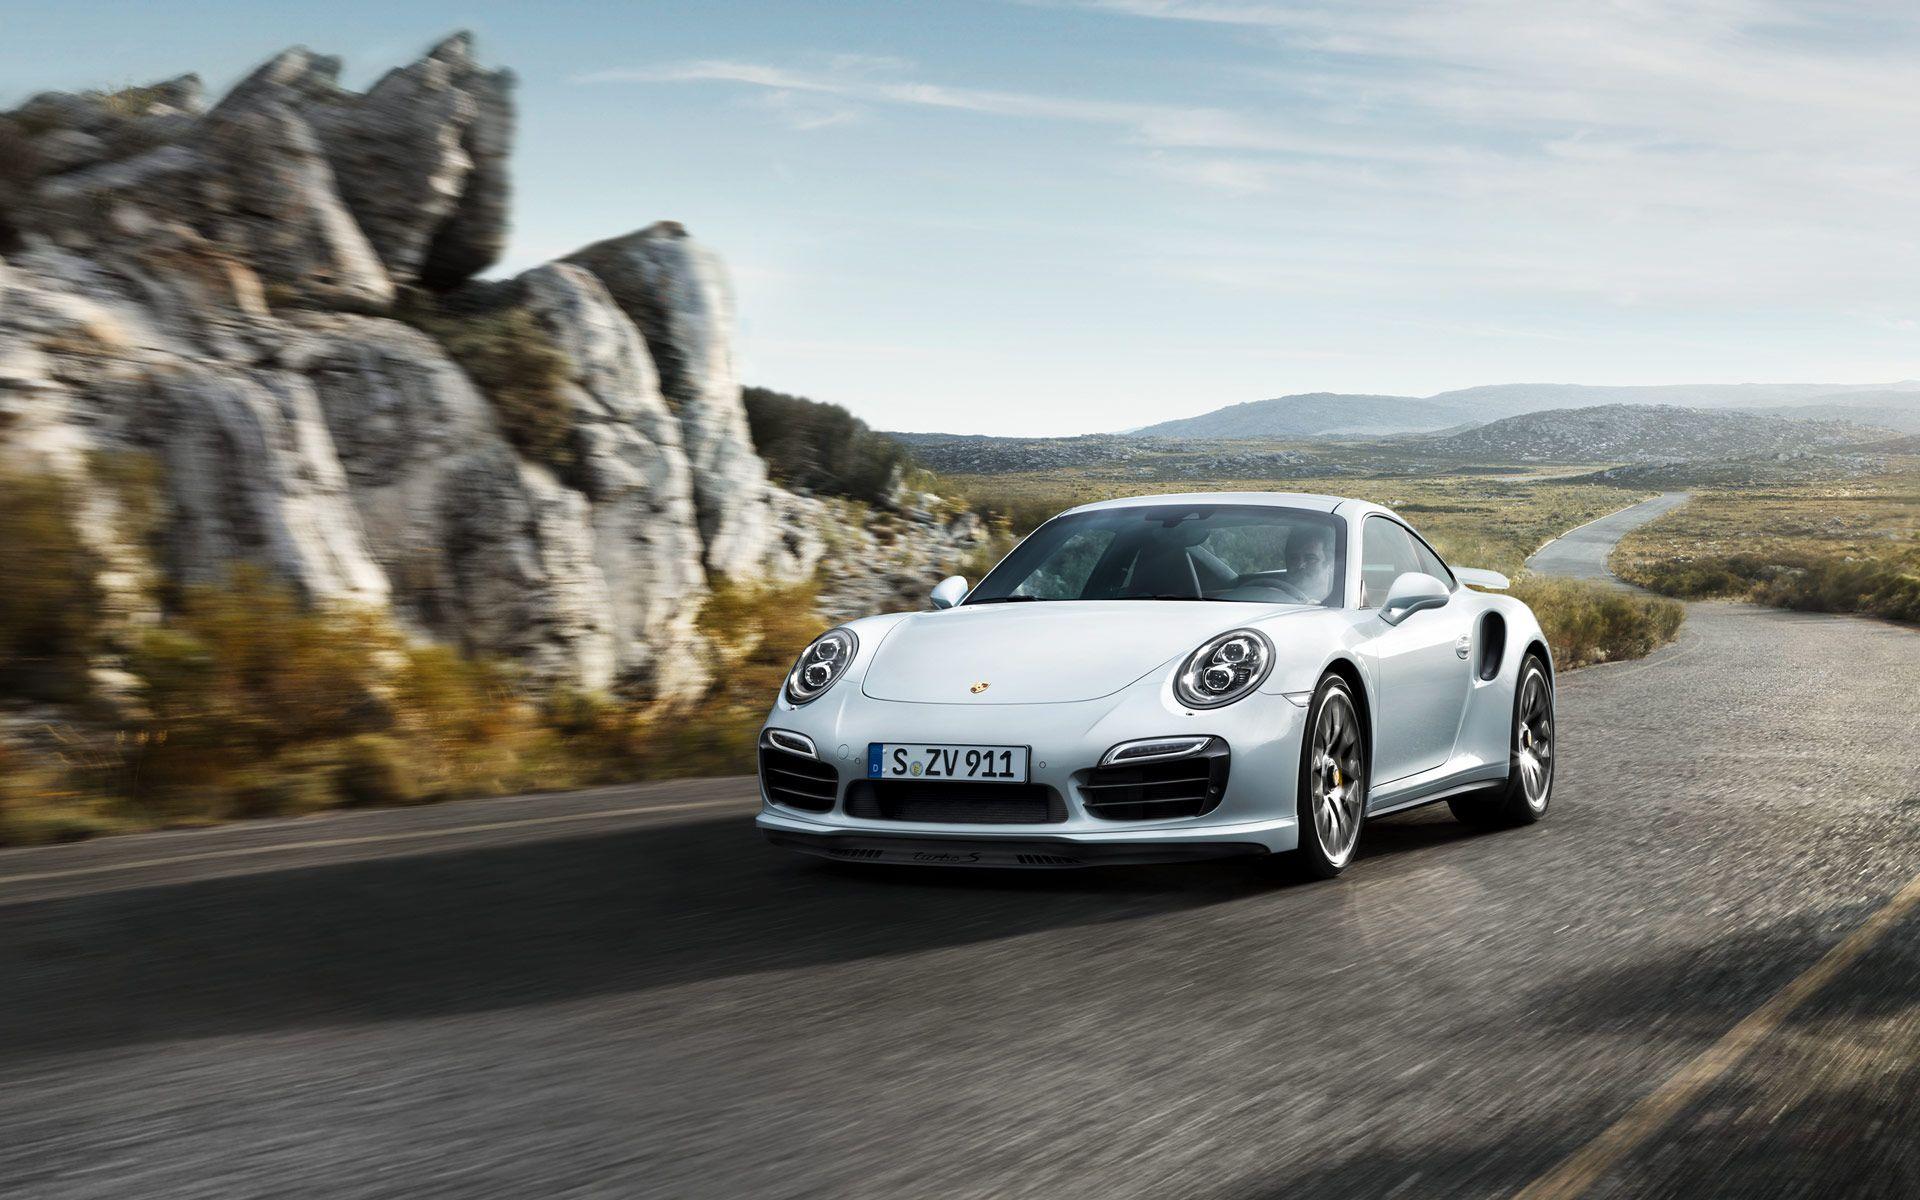 Porsche Wallpaper Porsche 911 Turbo Porsche 911 911 Turbo